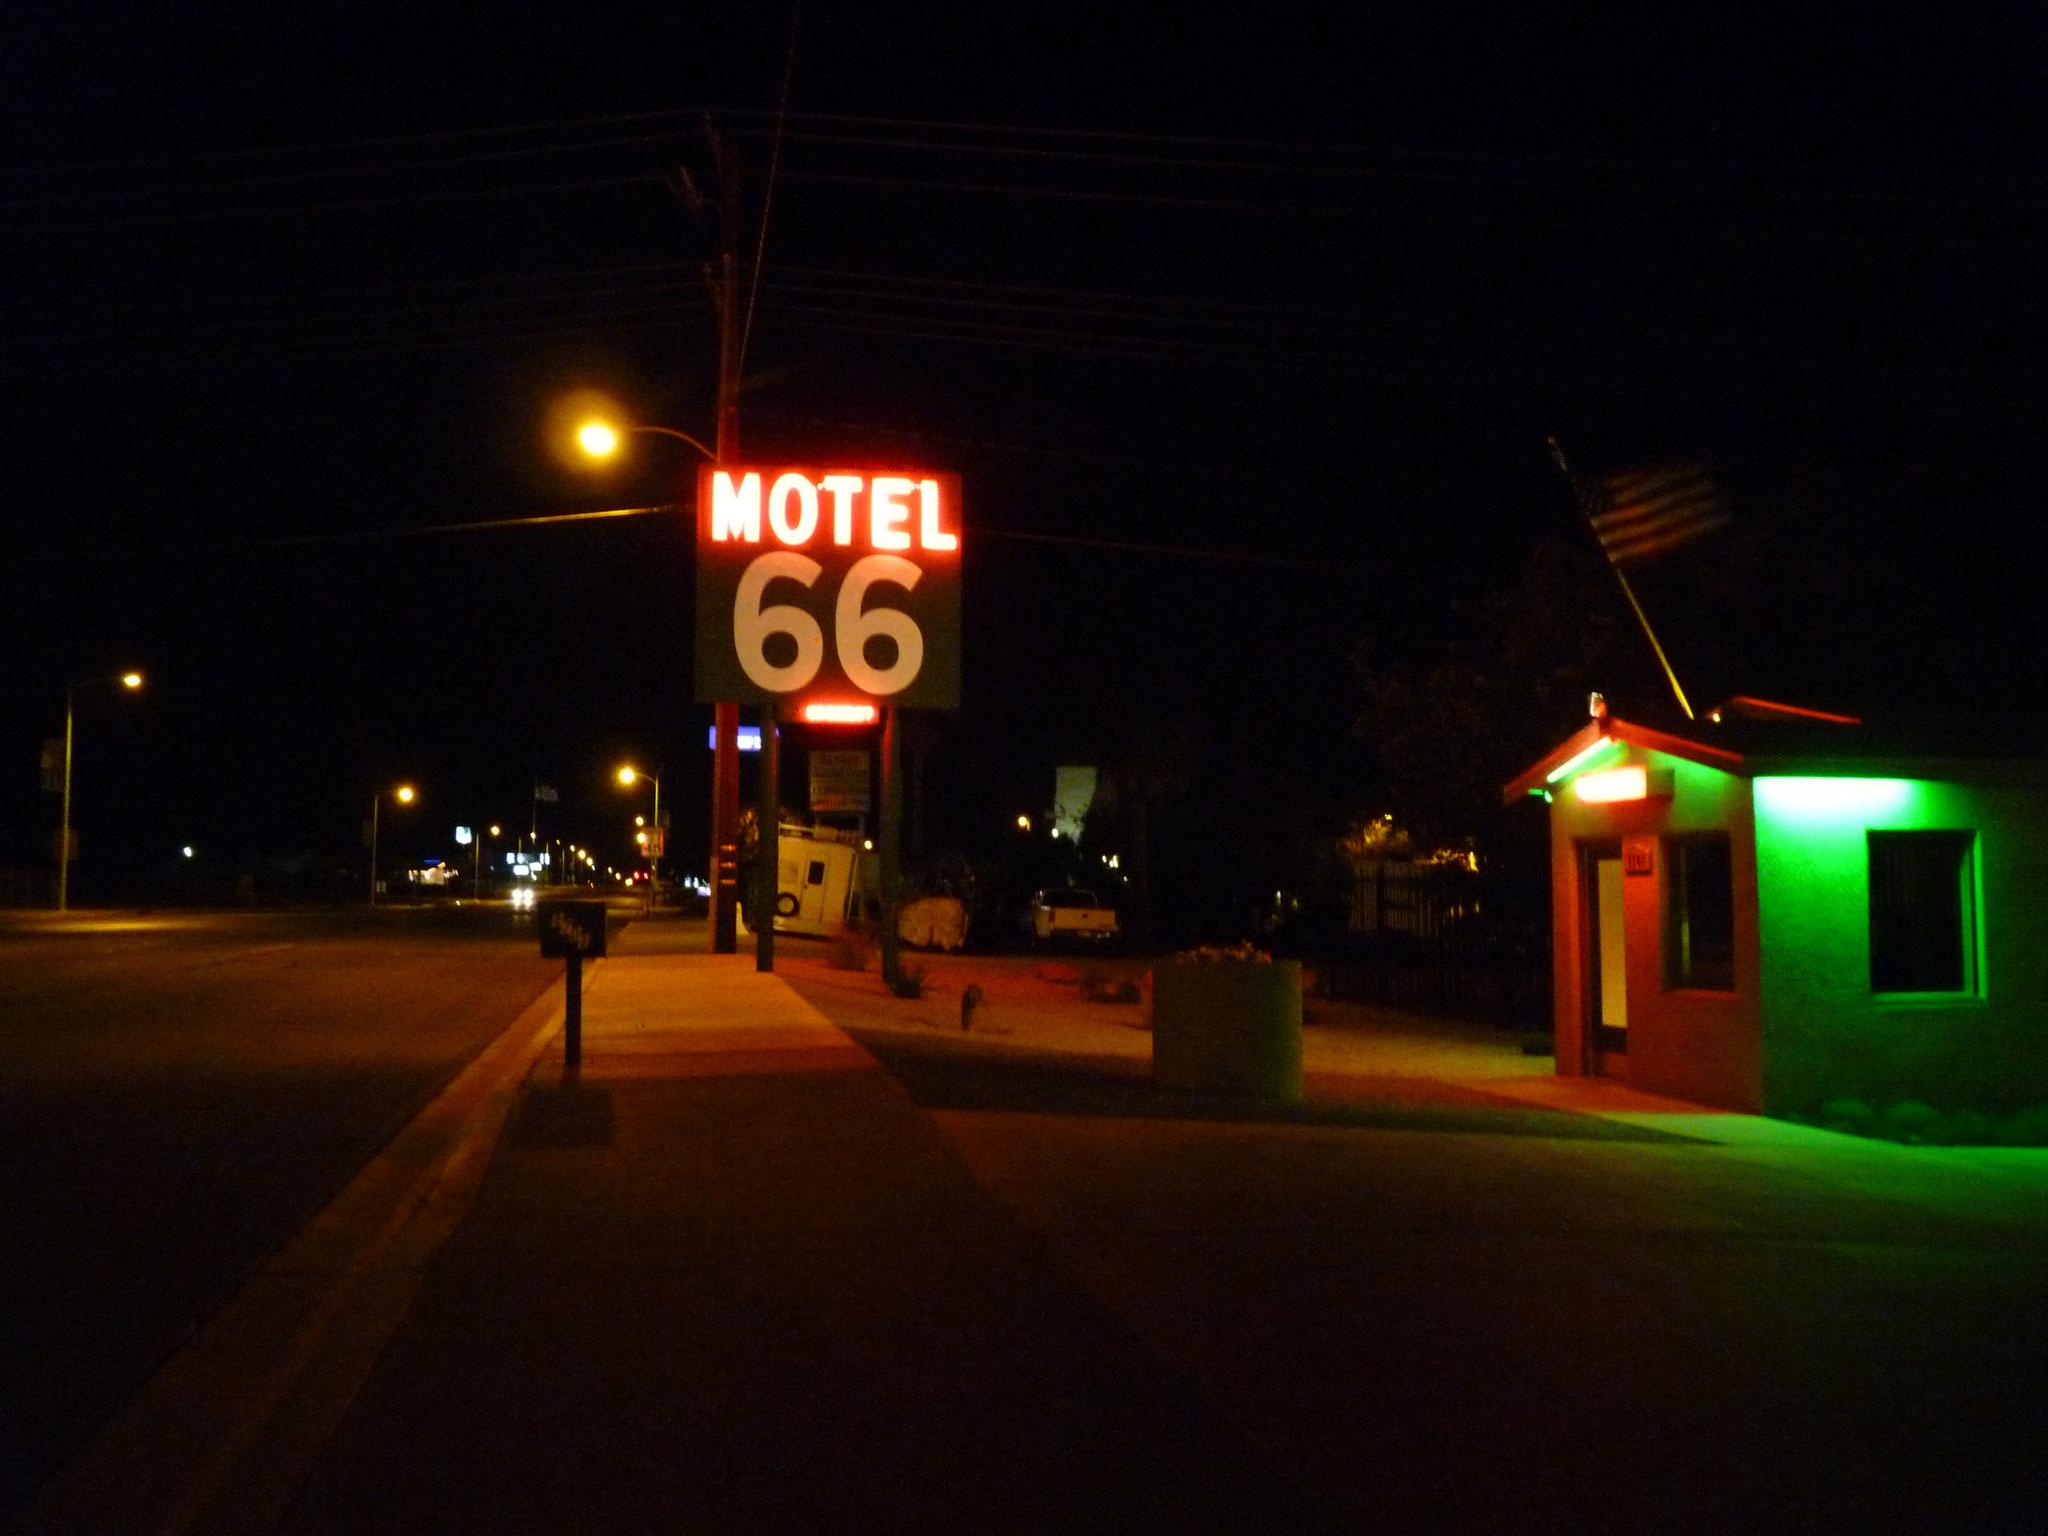 Motel 66 de Barstow